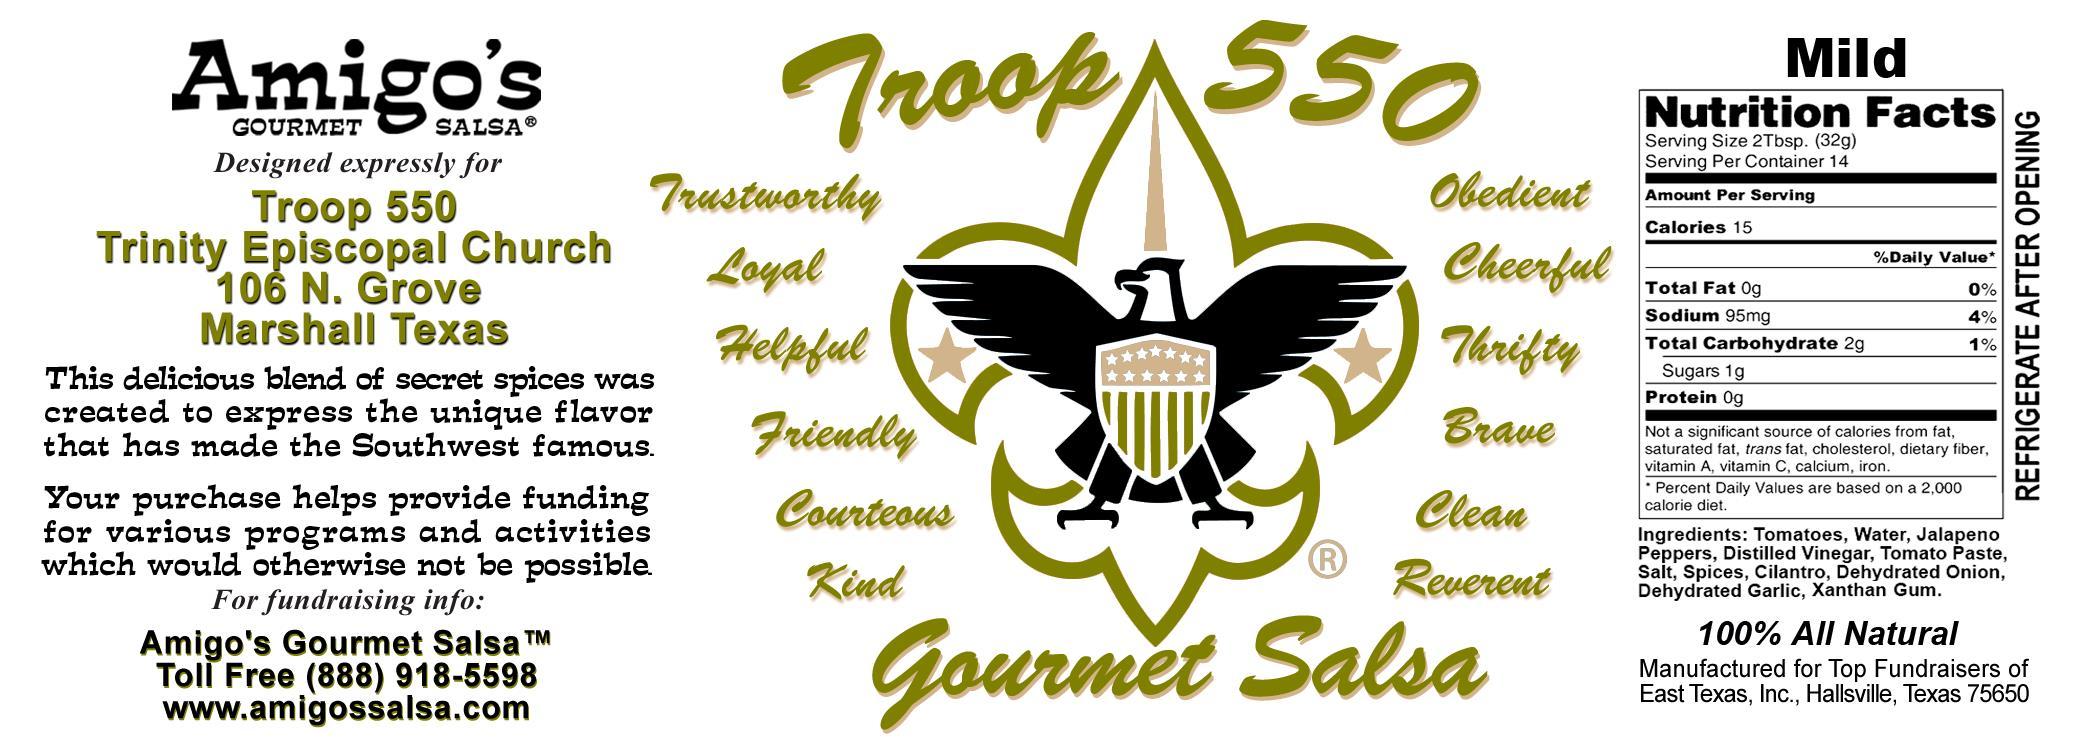 Boy Scouts Troop 550 Jar Label MILD.jpg